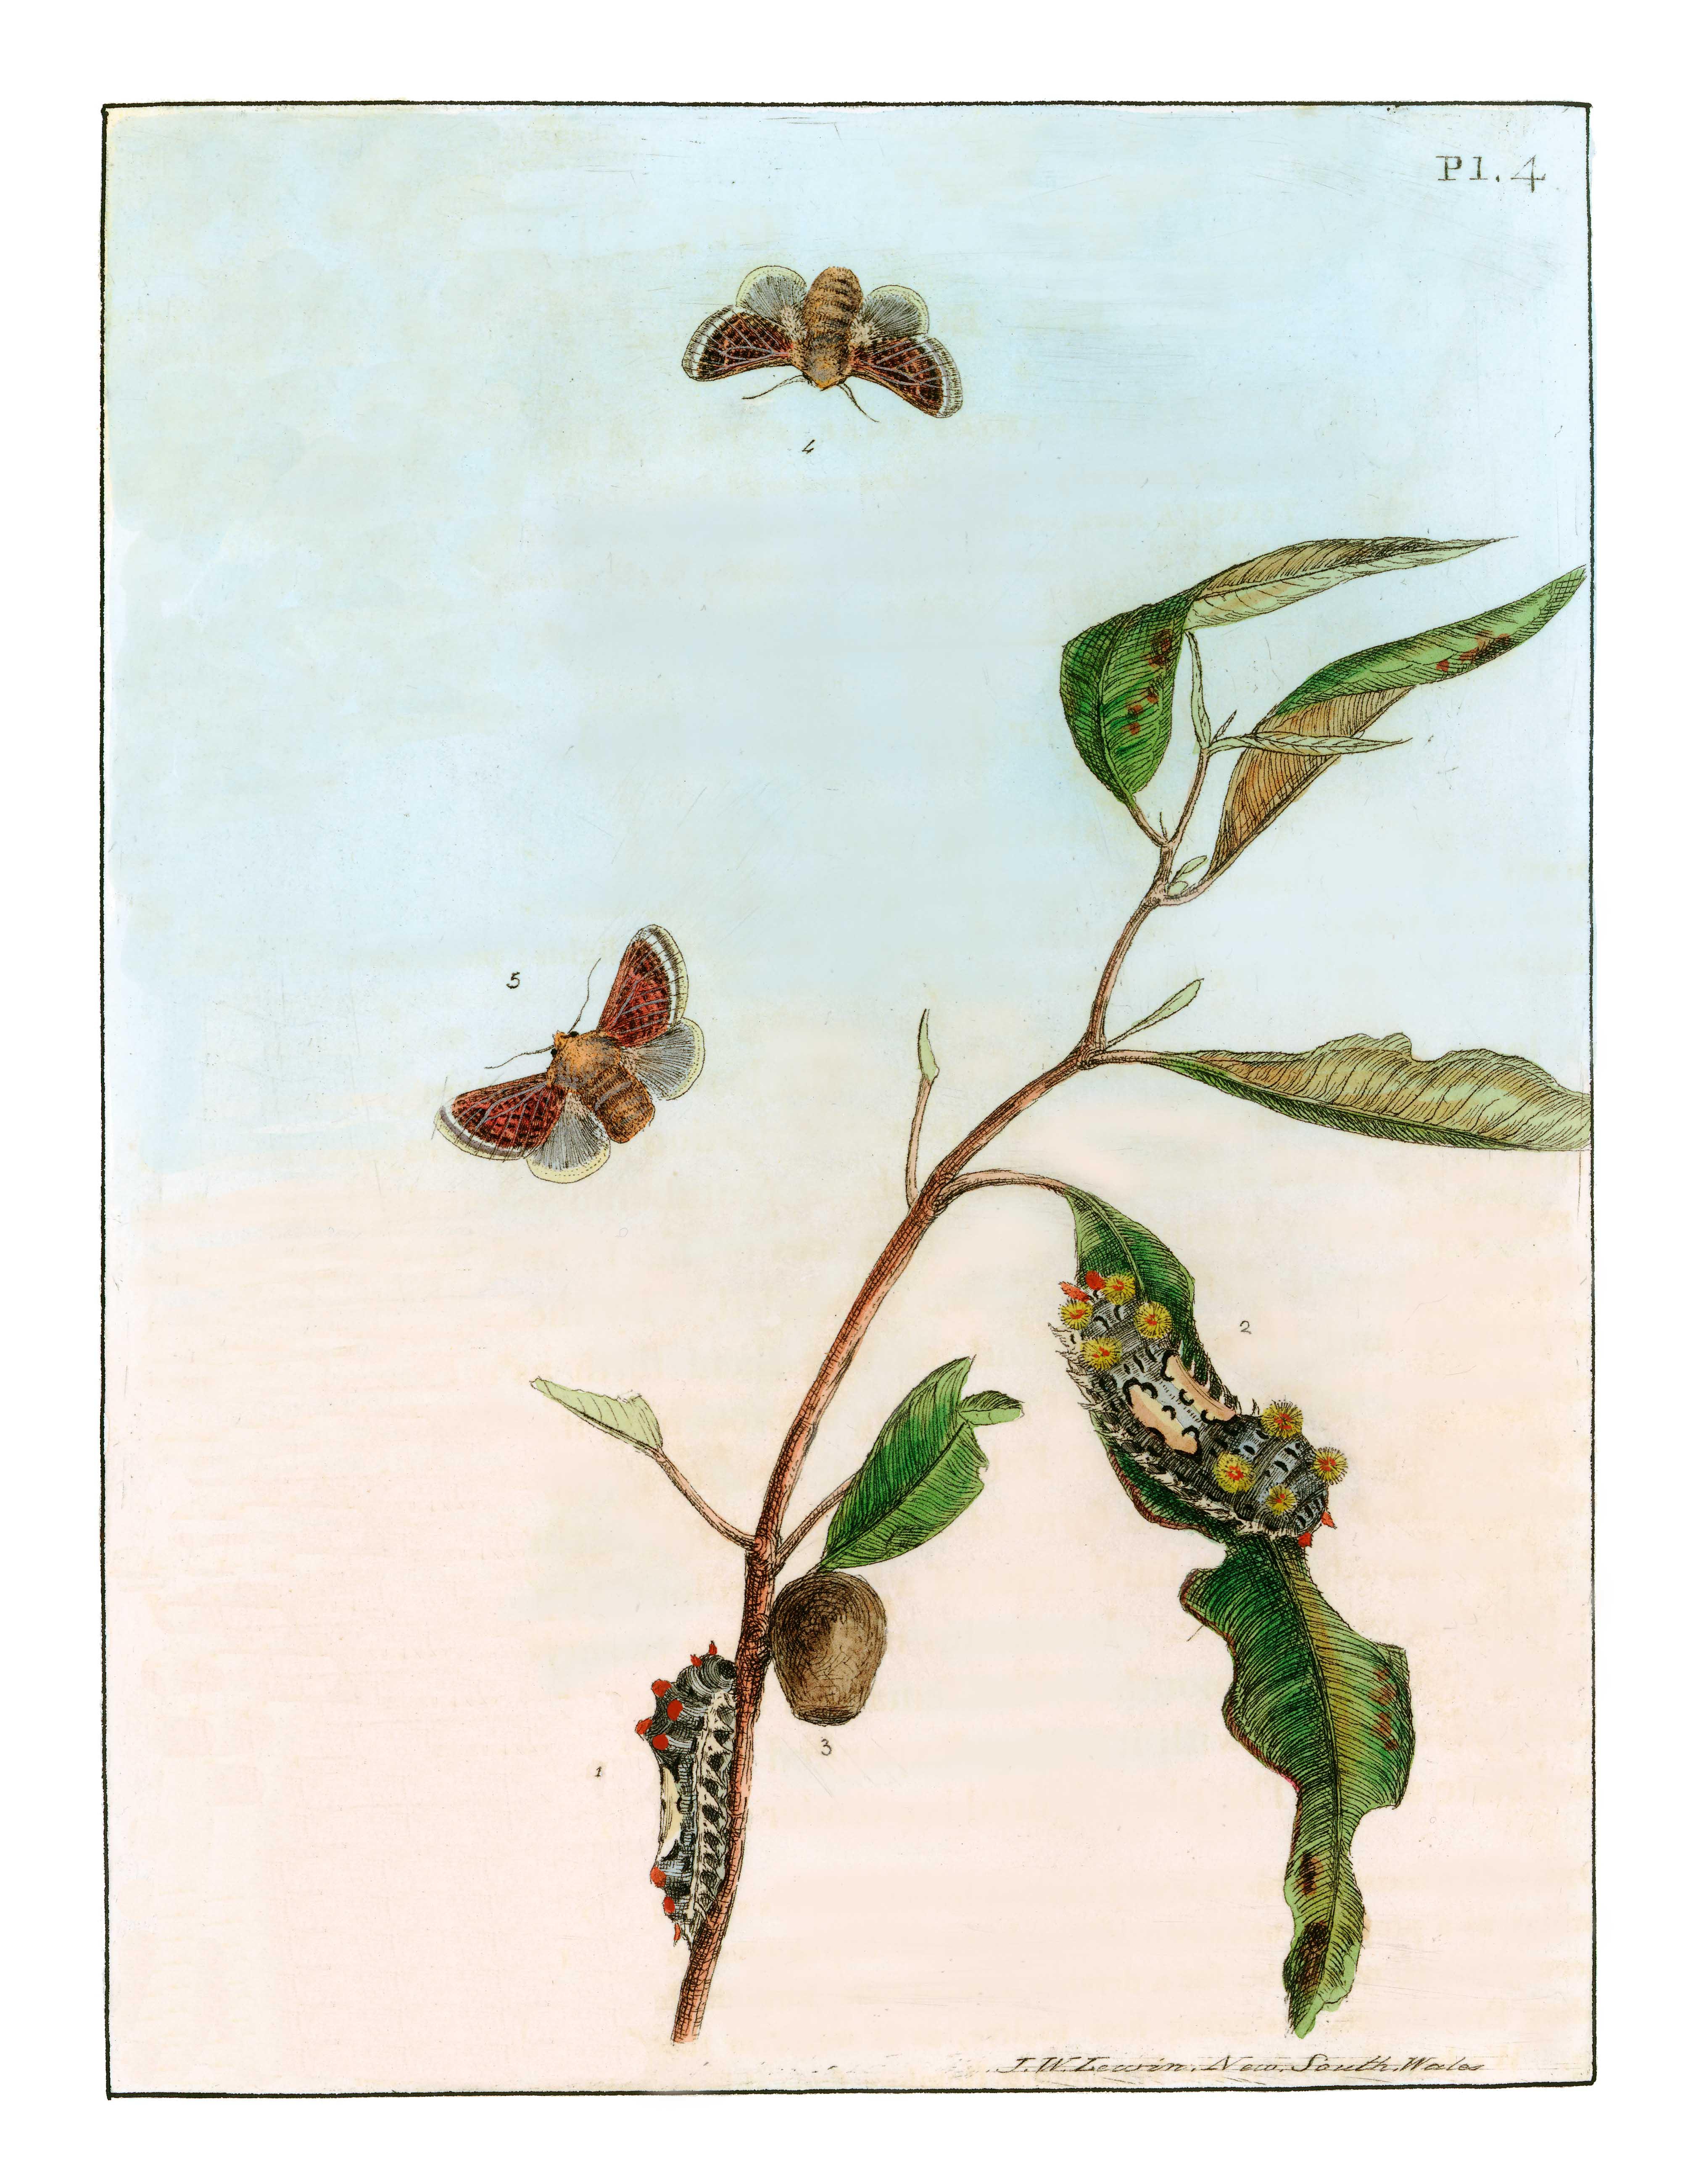 Lewin's lepidoptera